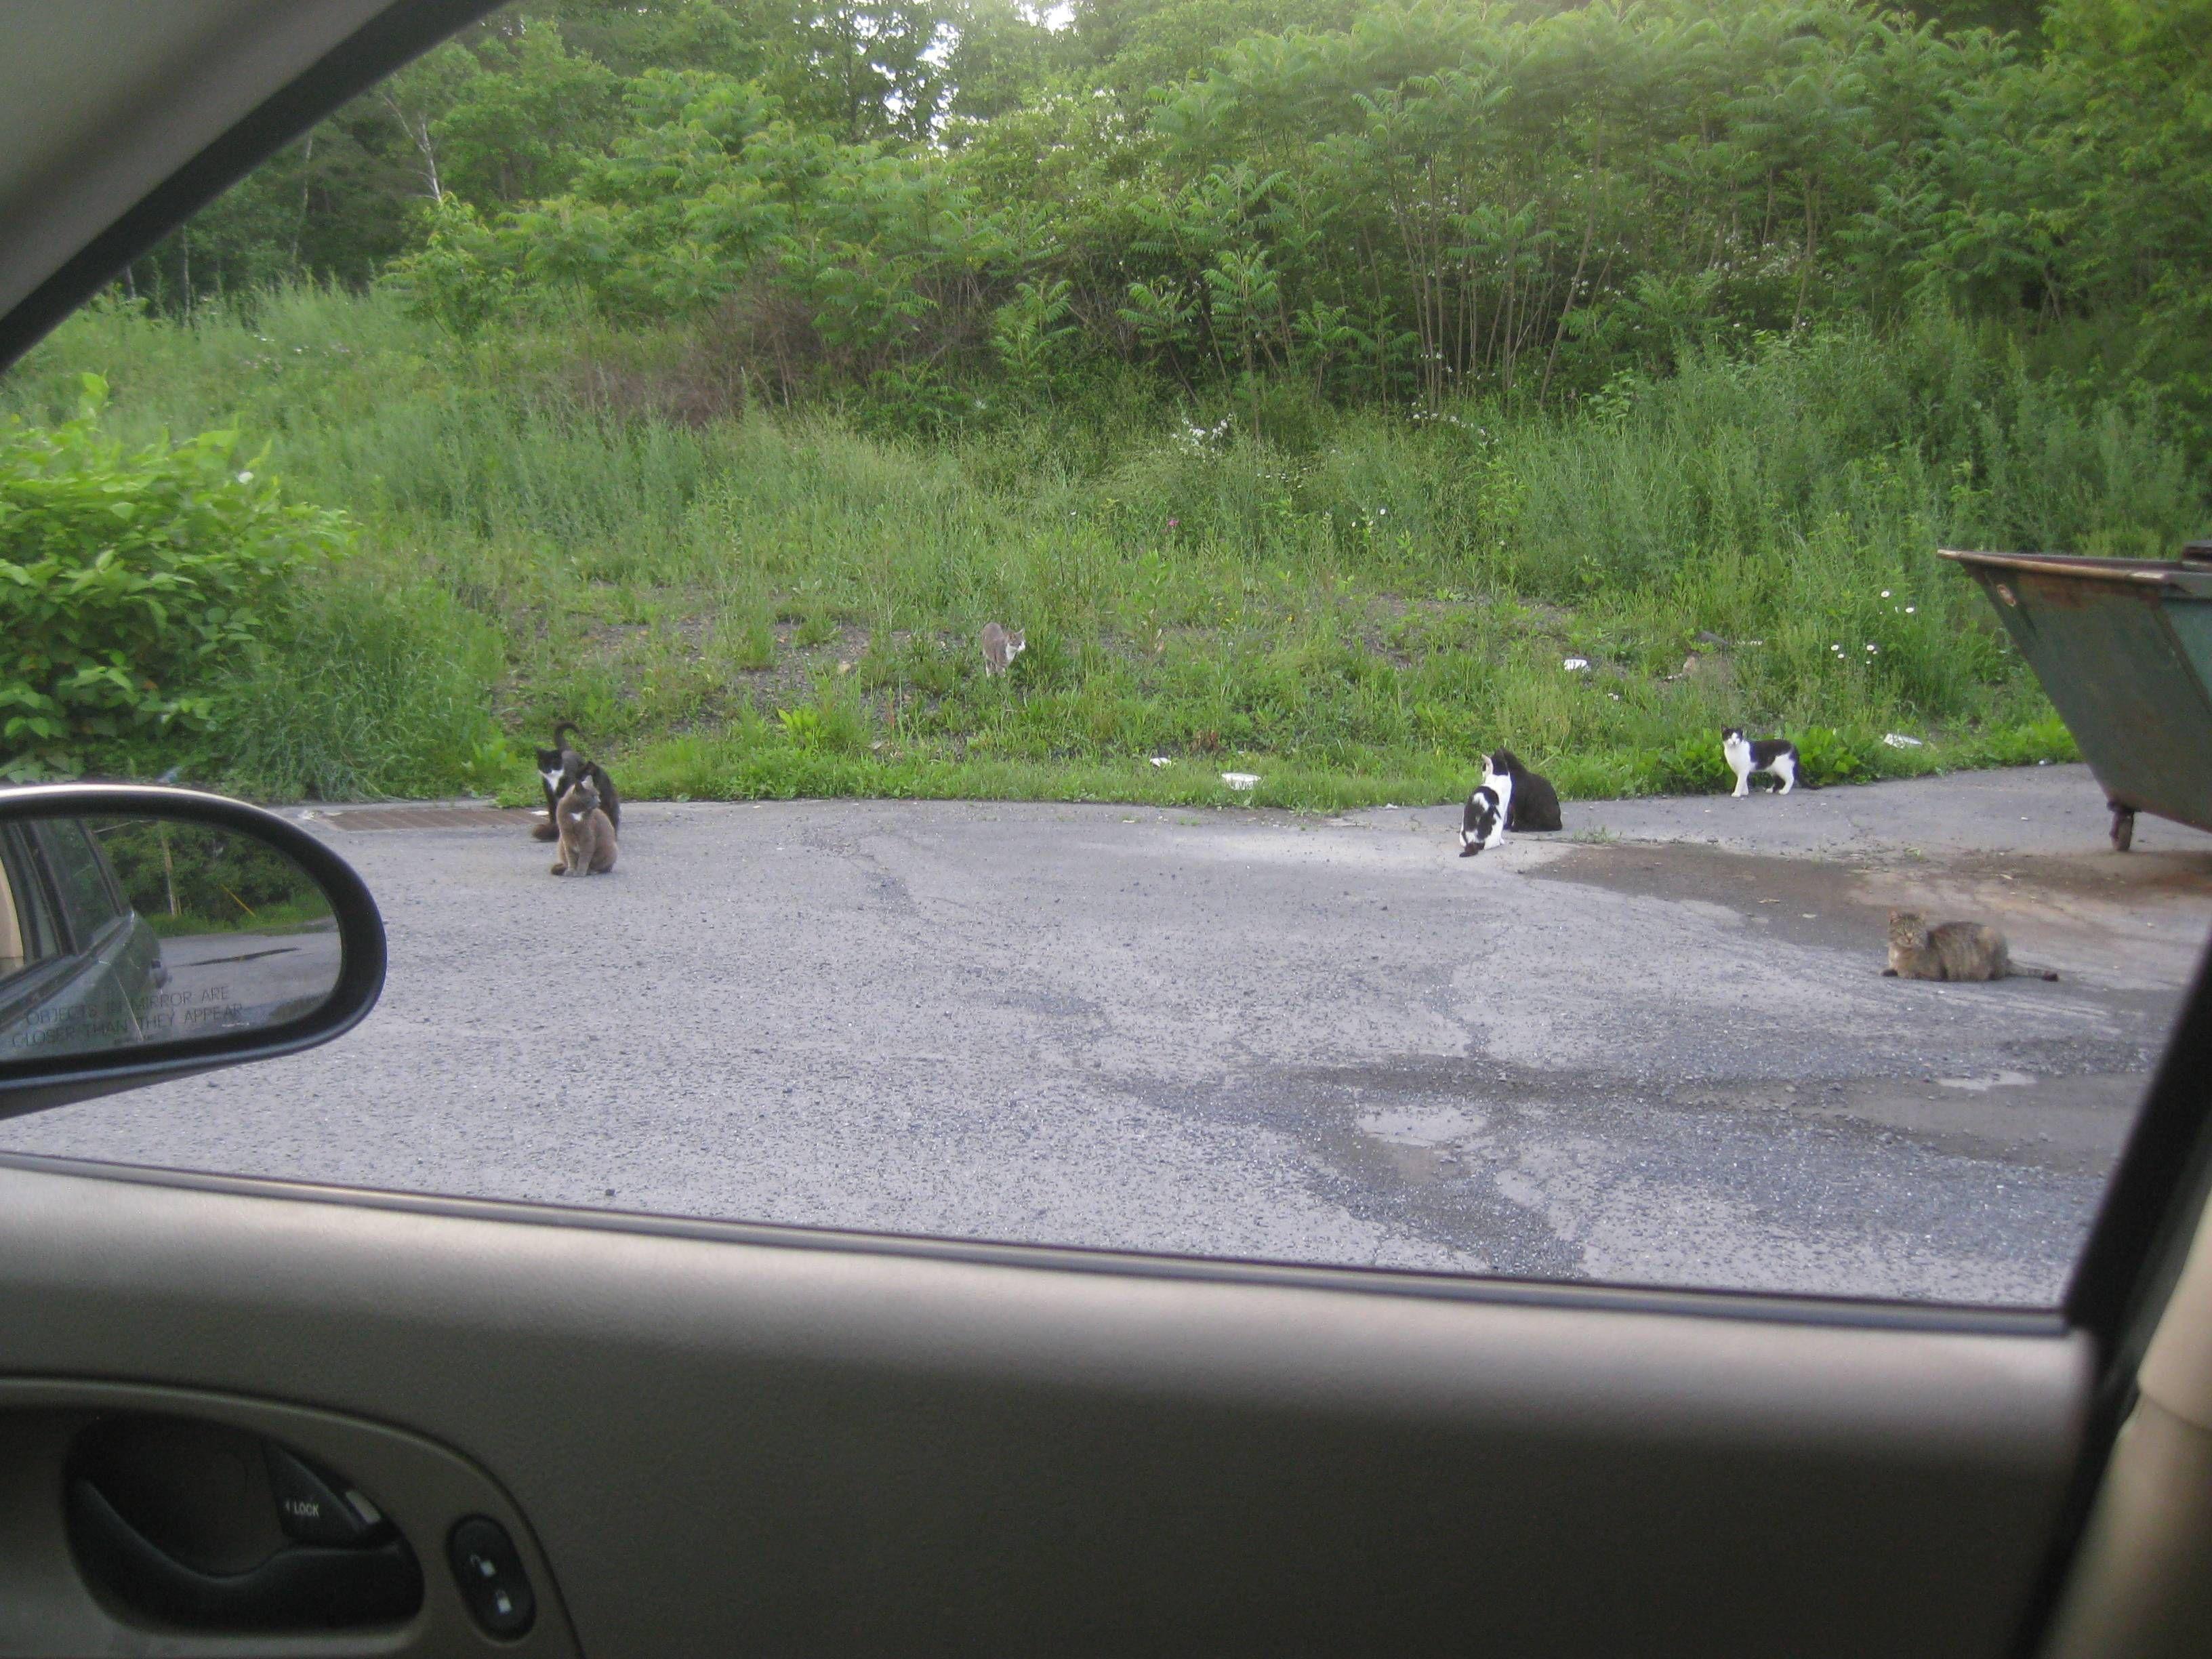 I think I'm in the wrong neighborhood....